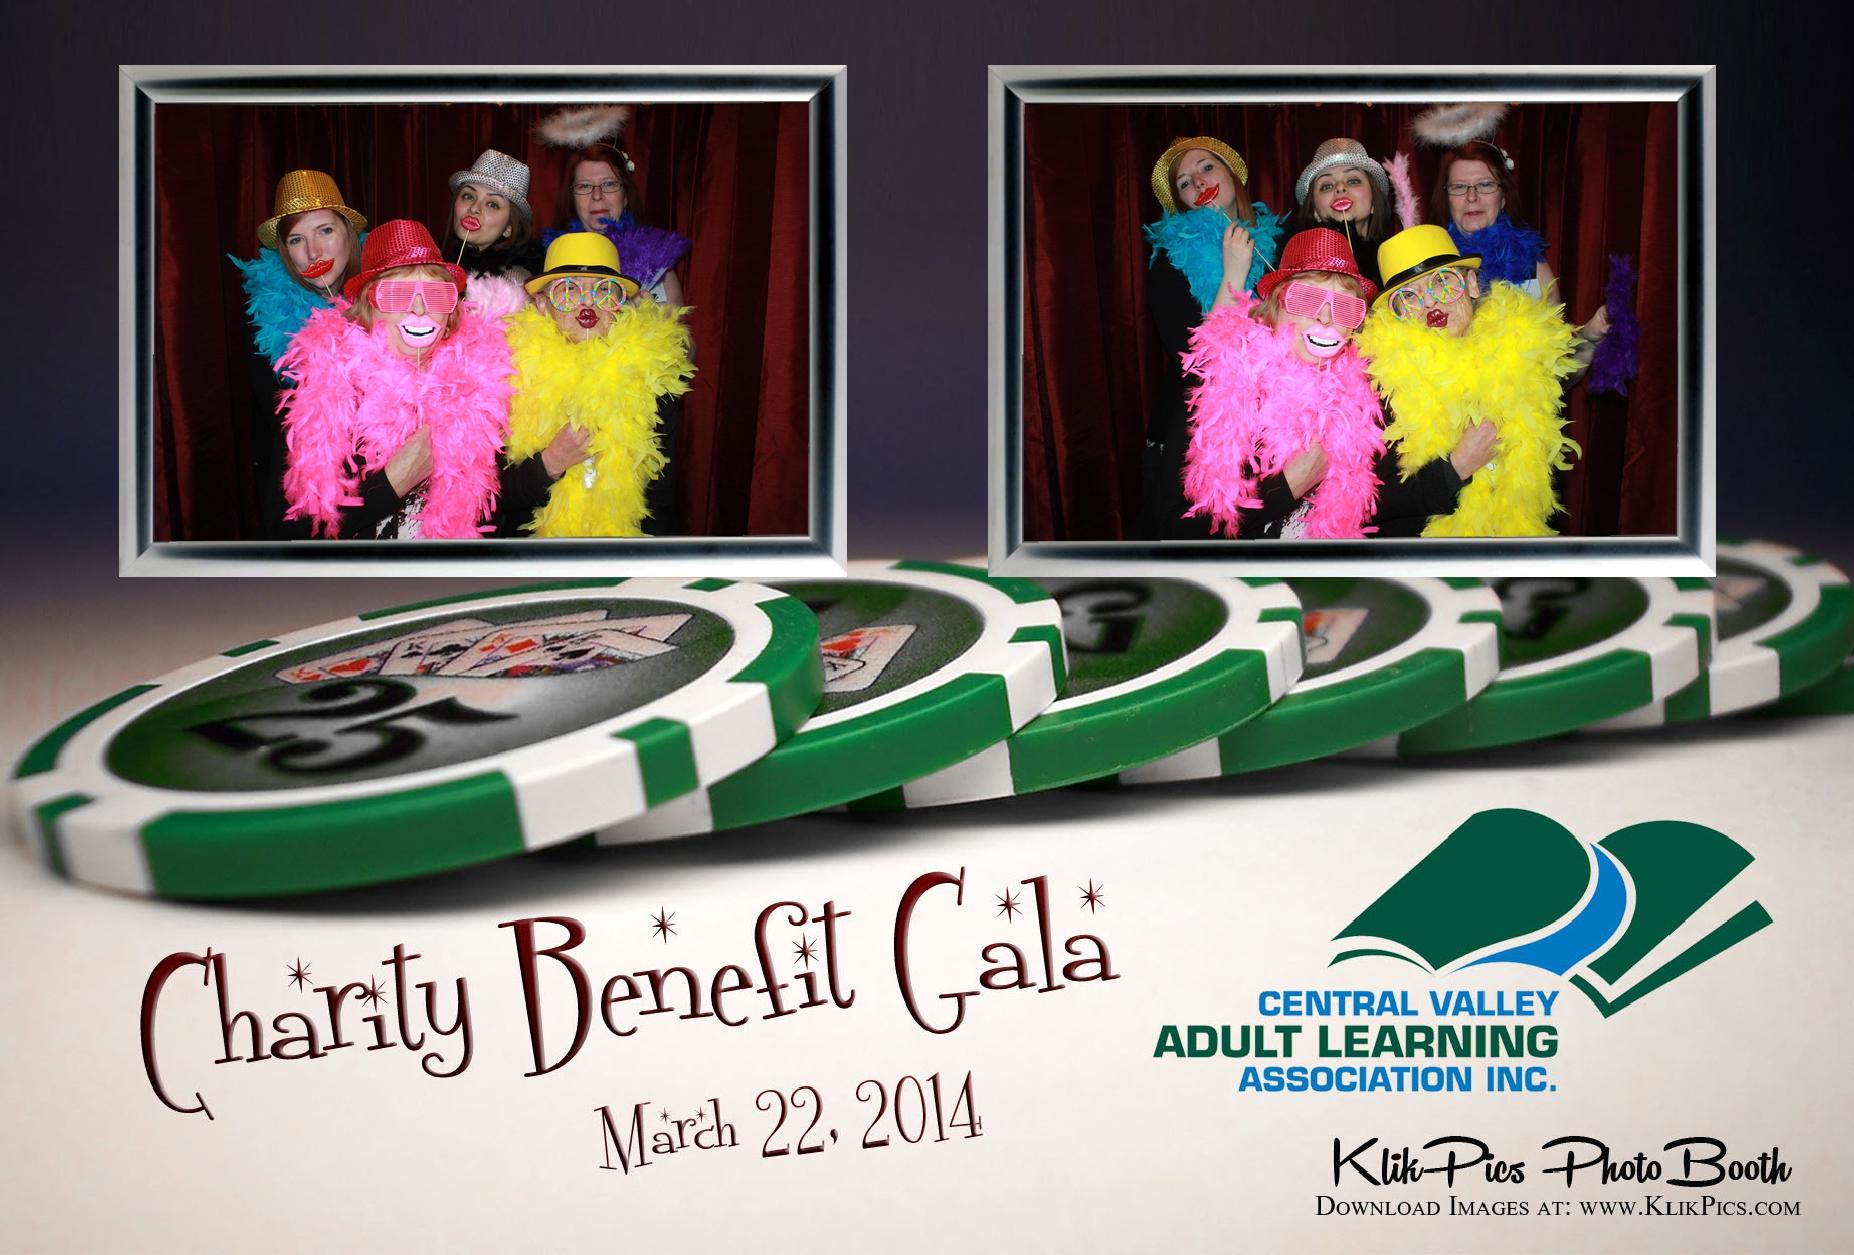 2014 Charity Benefit Gala